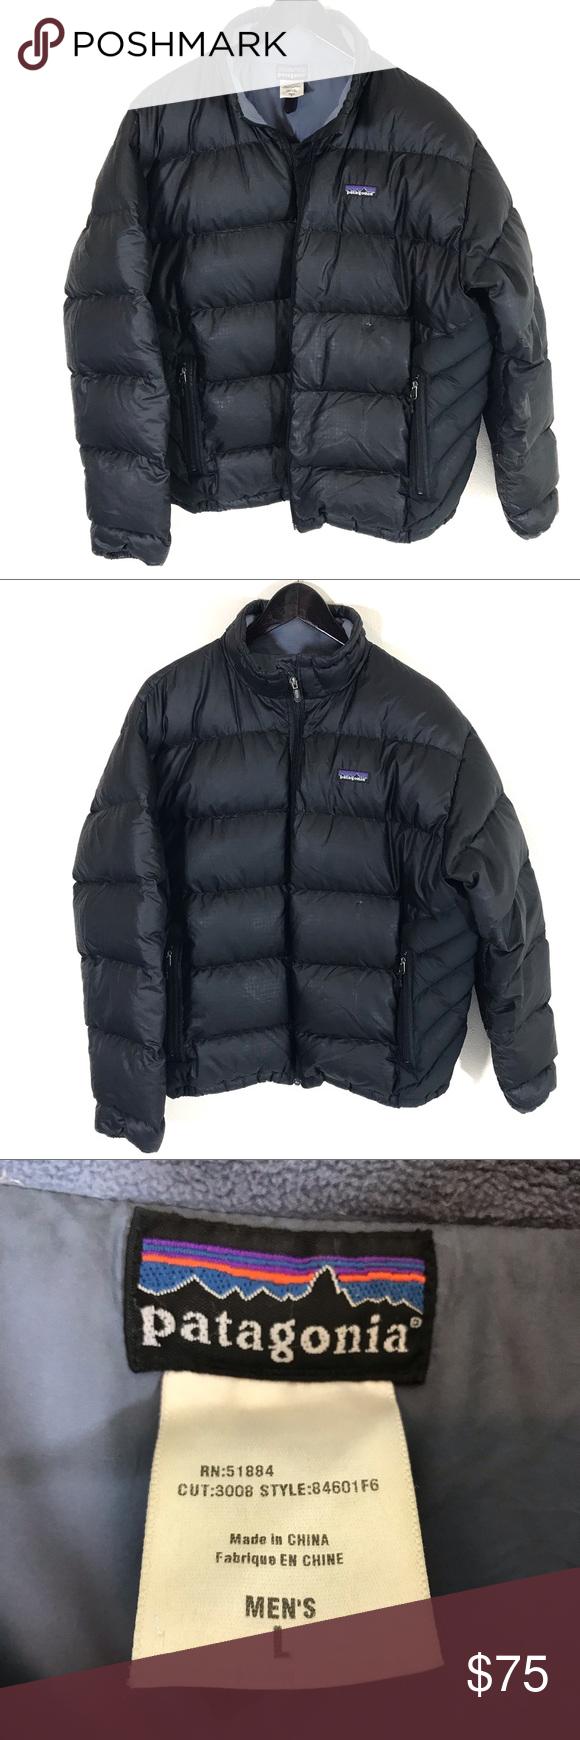 Men S Patagonia Black Down Jacket Black Down Jackets Down Jacket [ 1740 x 580 Pixel ]